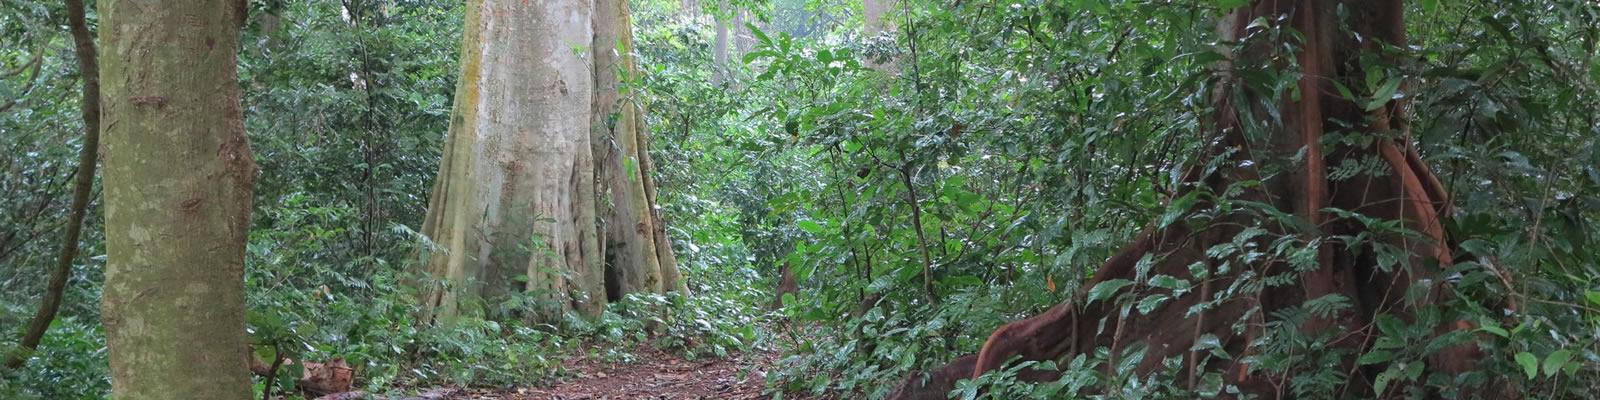 Full Day Hike at Rau Forest Reserve near Moshi